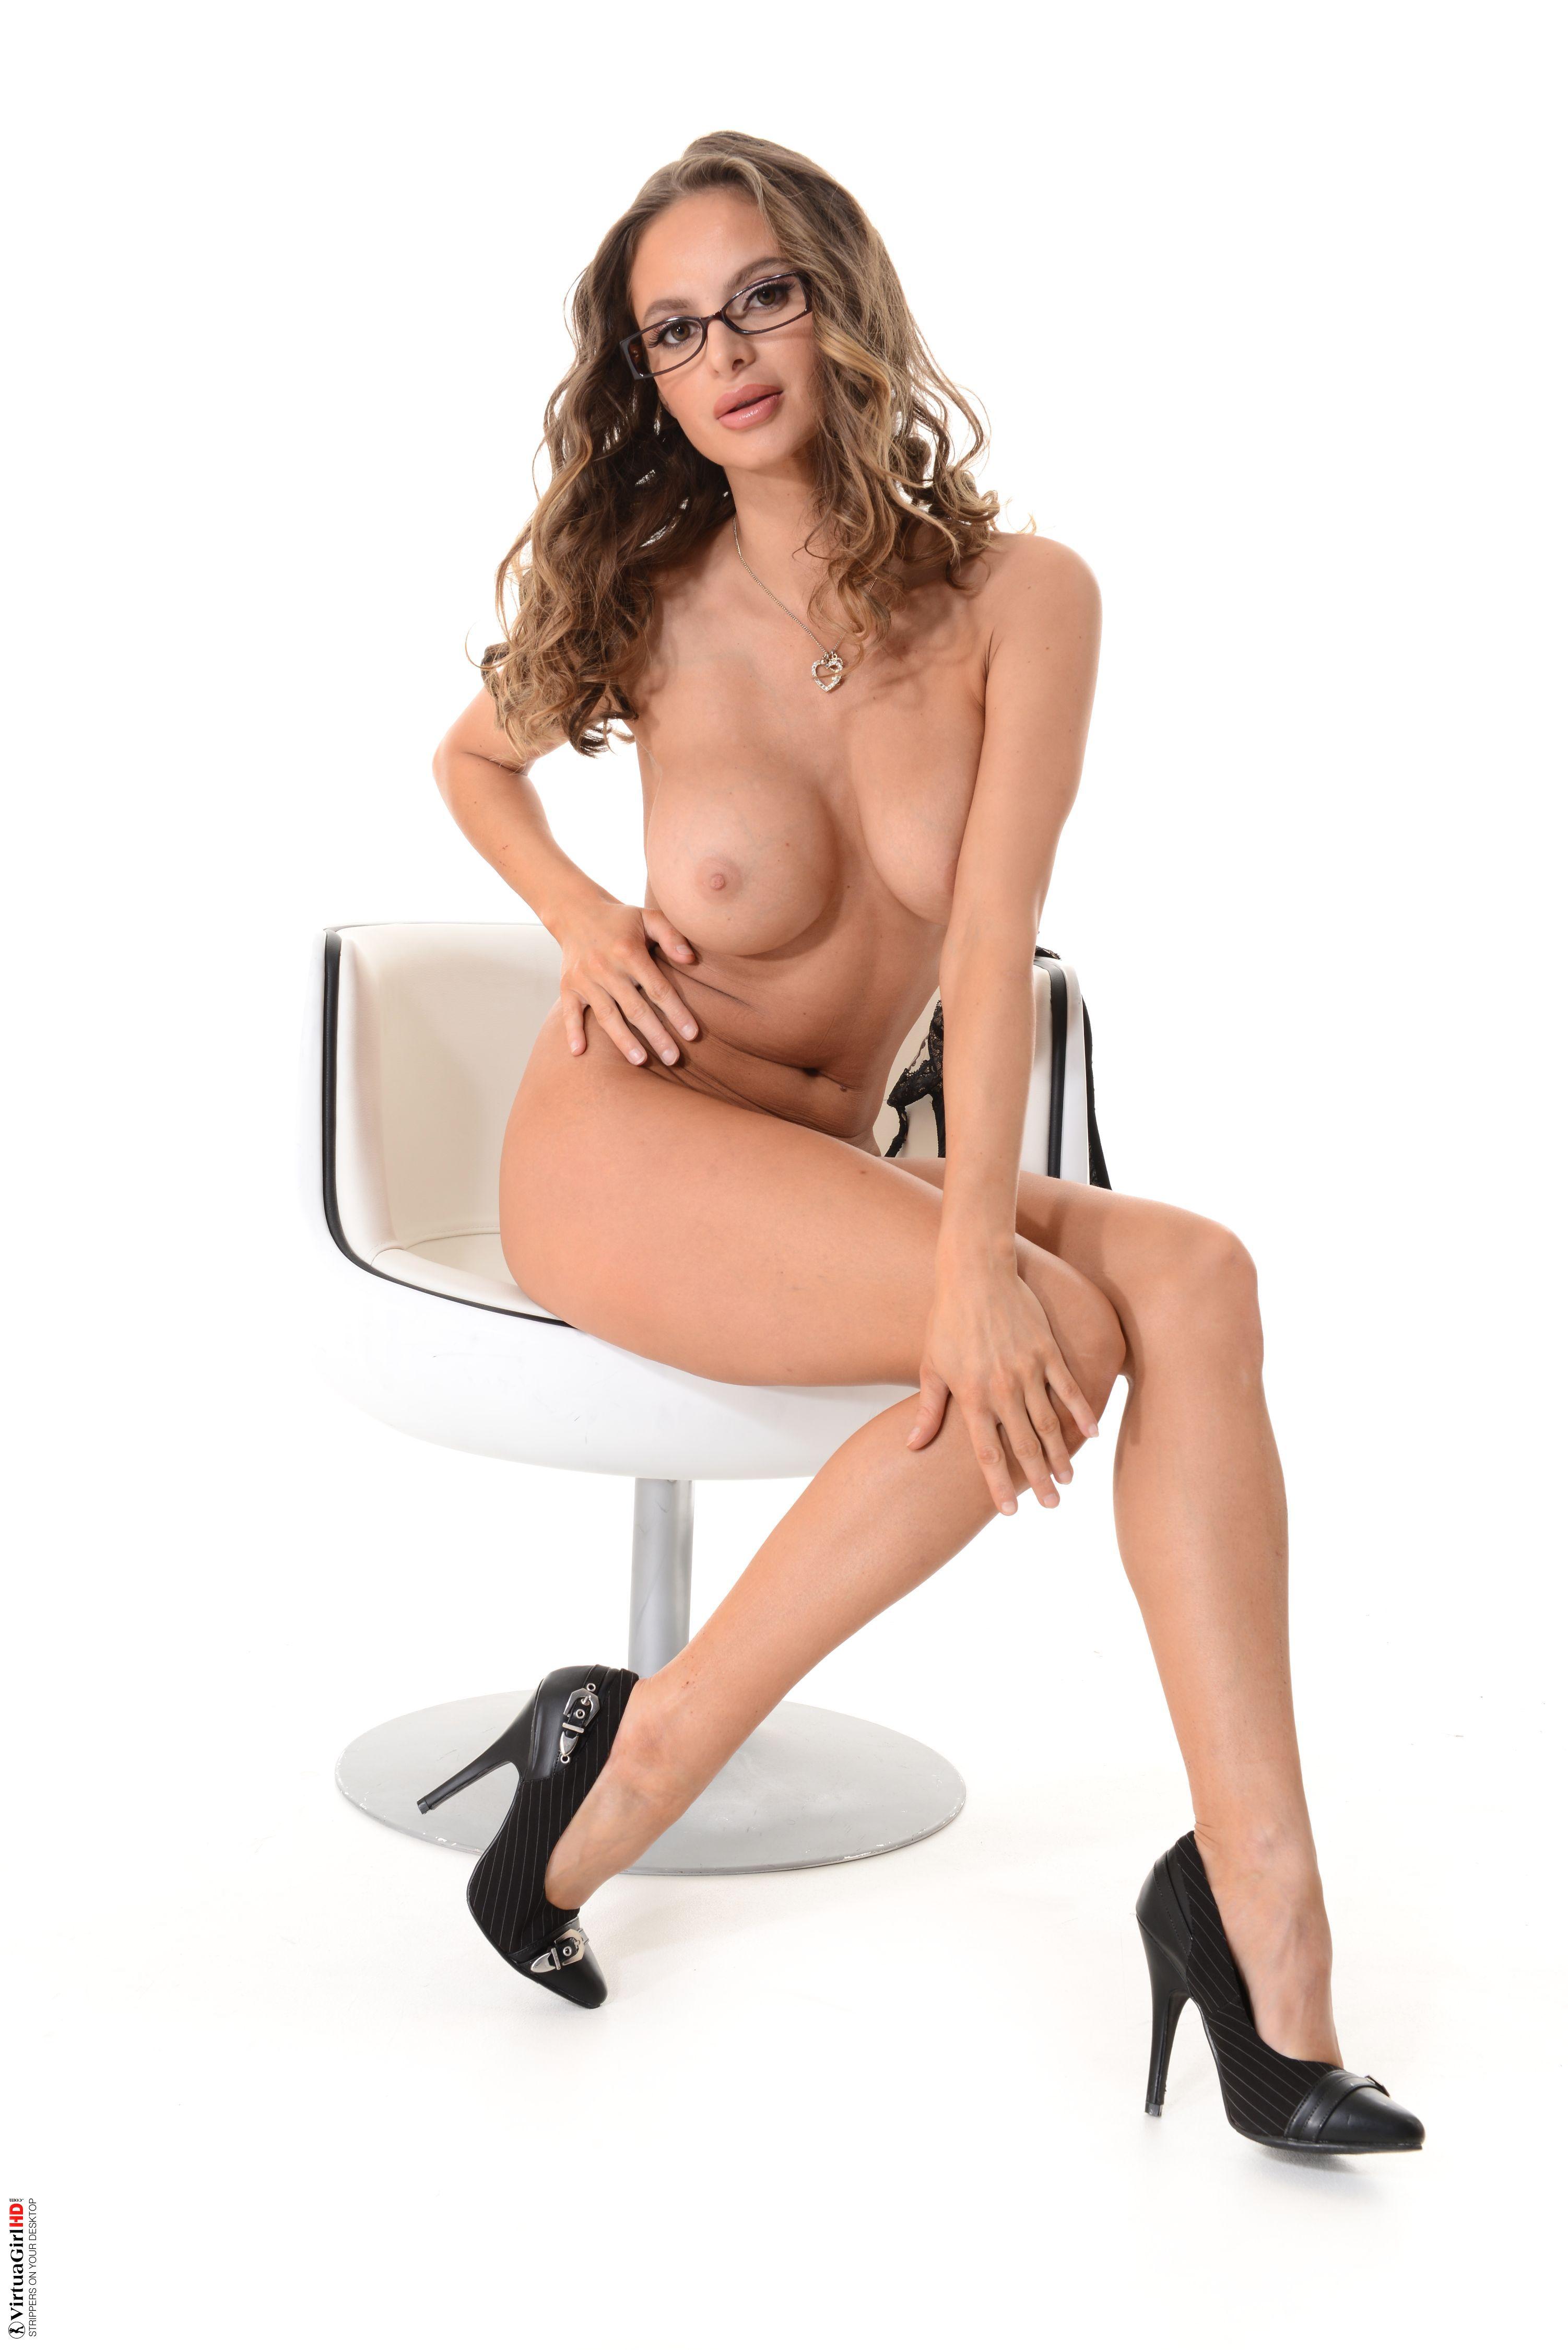 nudes wallpaper